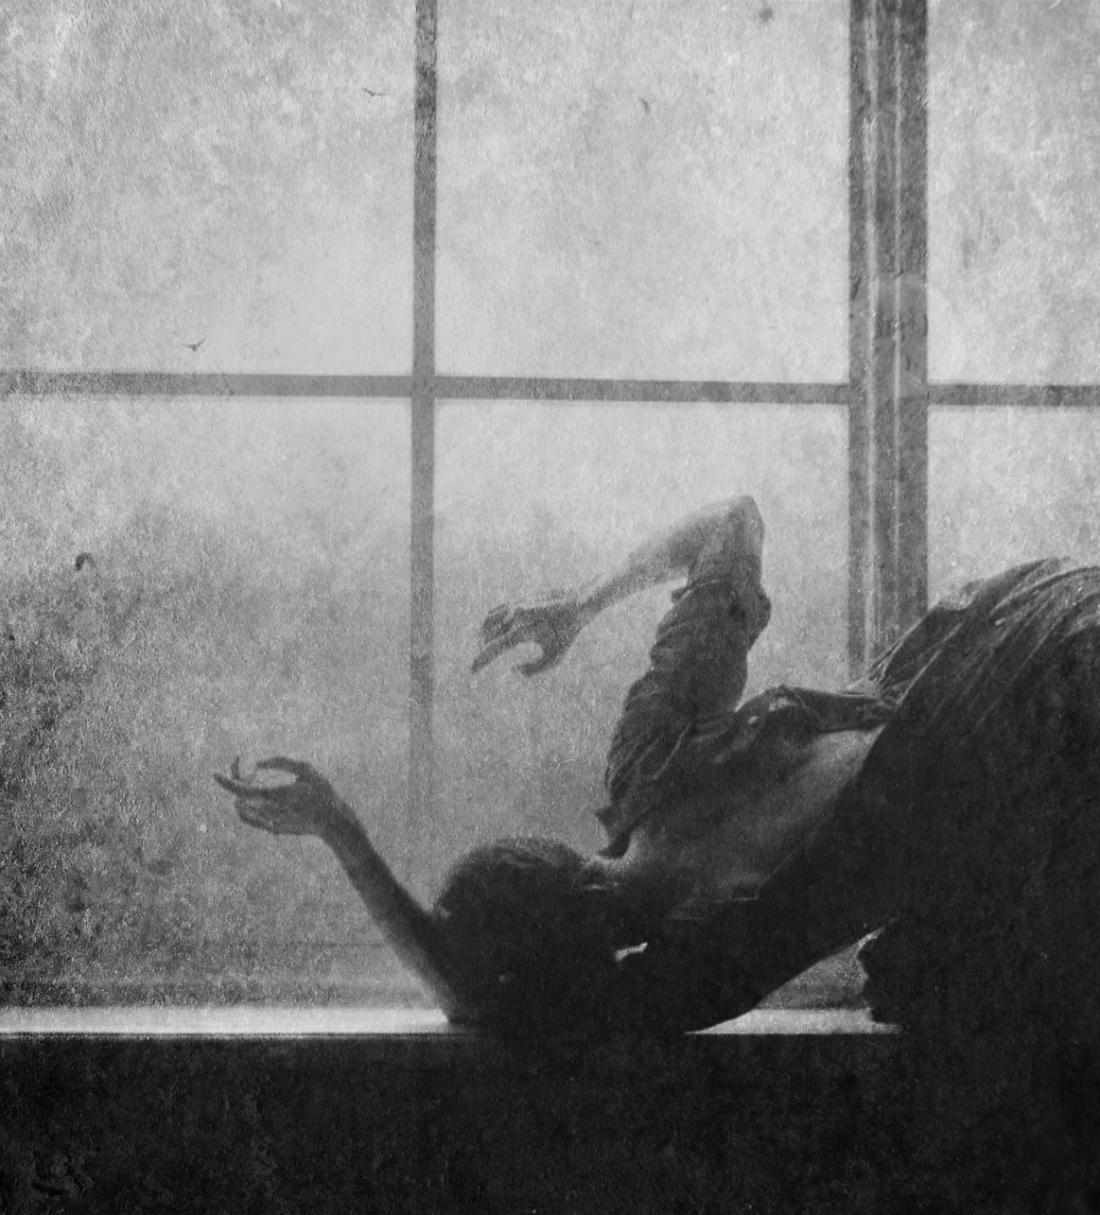 Natalia Drepina, Wistful Soul